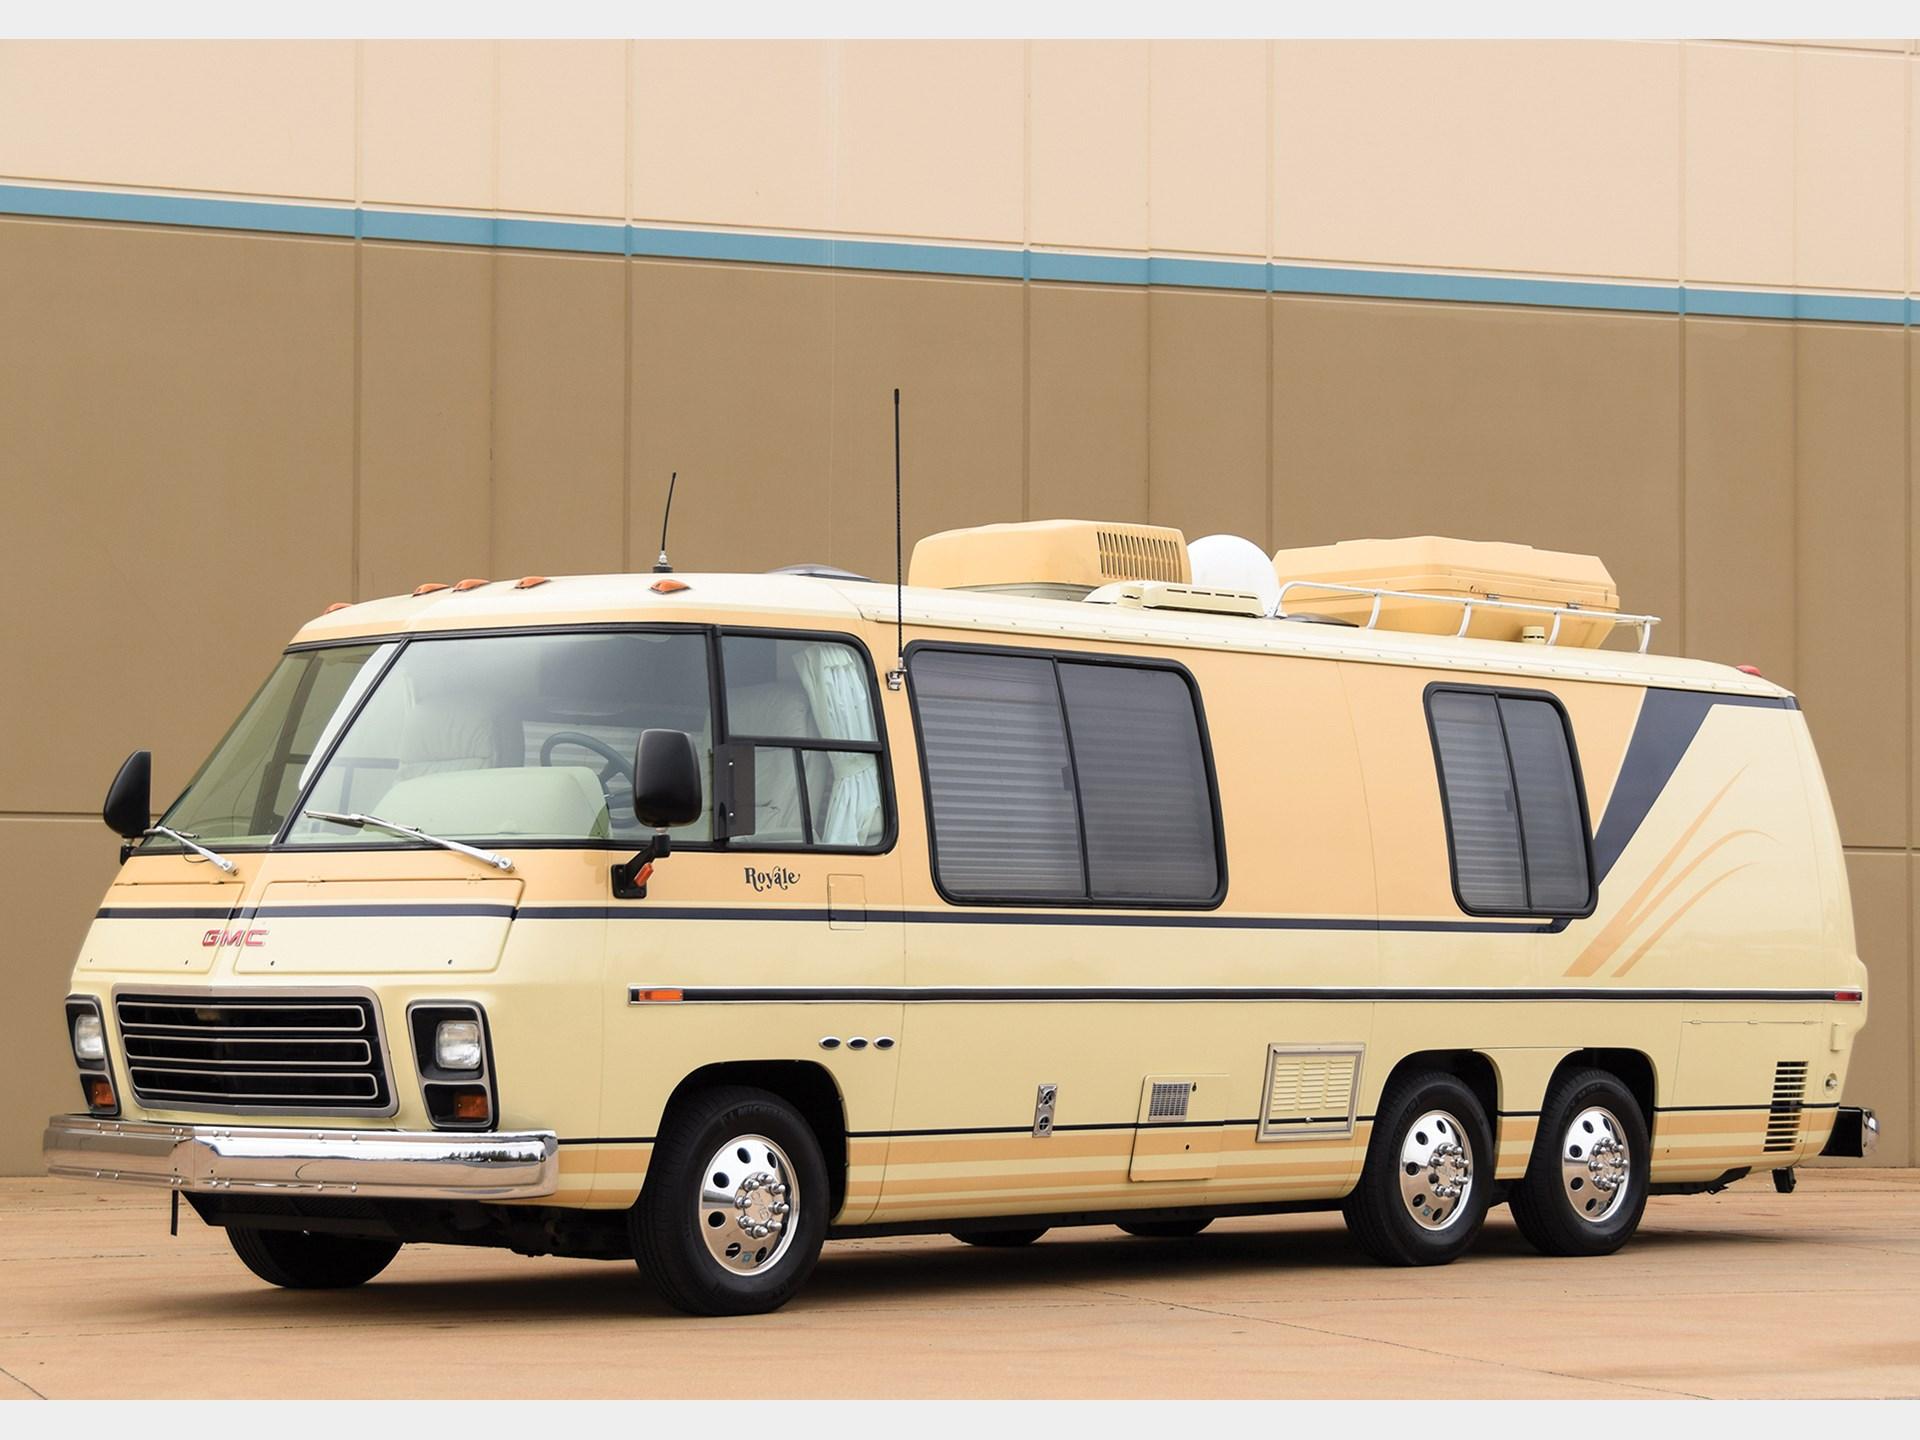 RM Sotheby's - 1978 GMC Royale Motorhome | Auburn Spring 2018